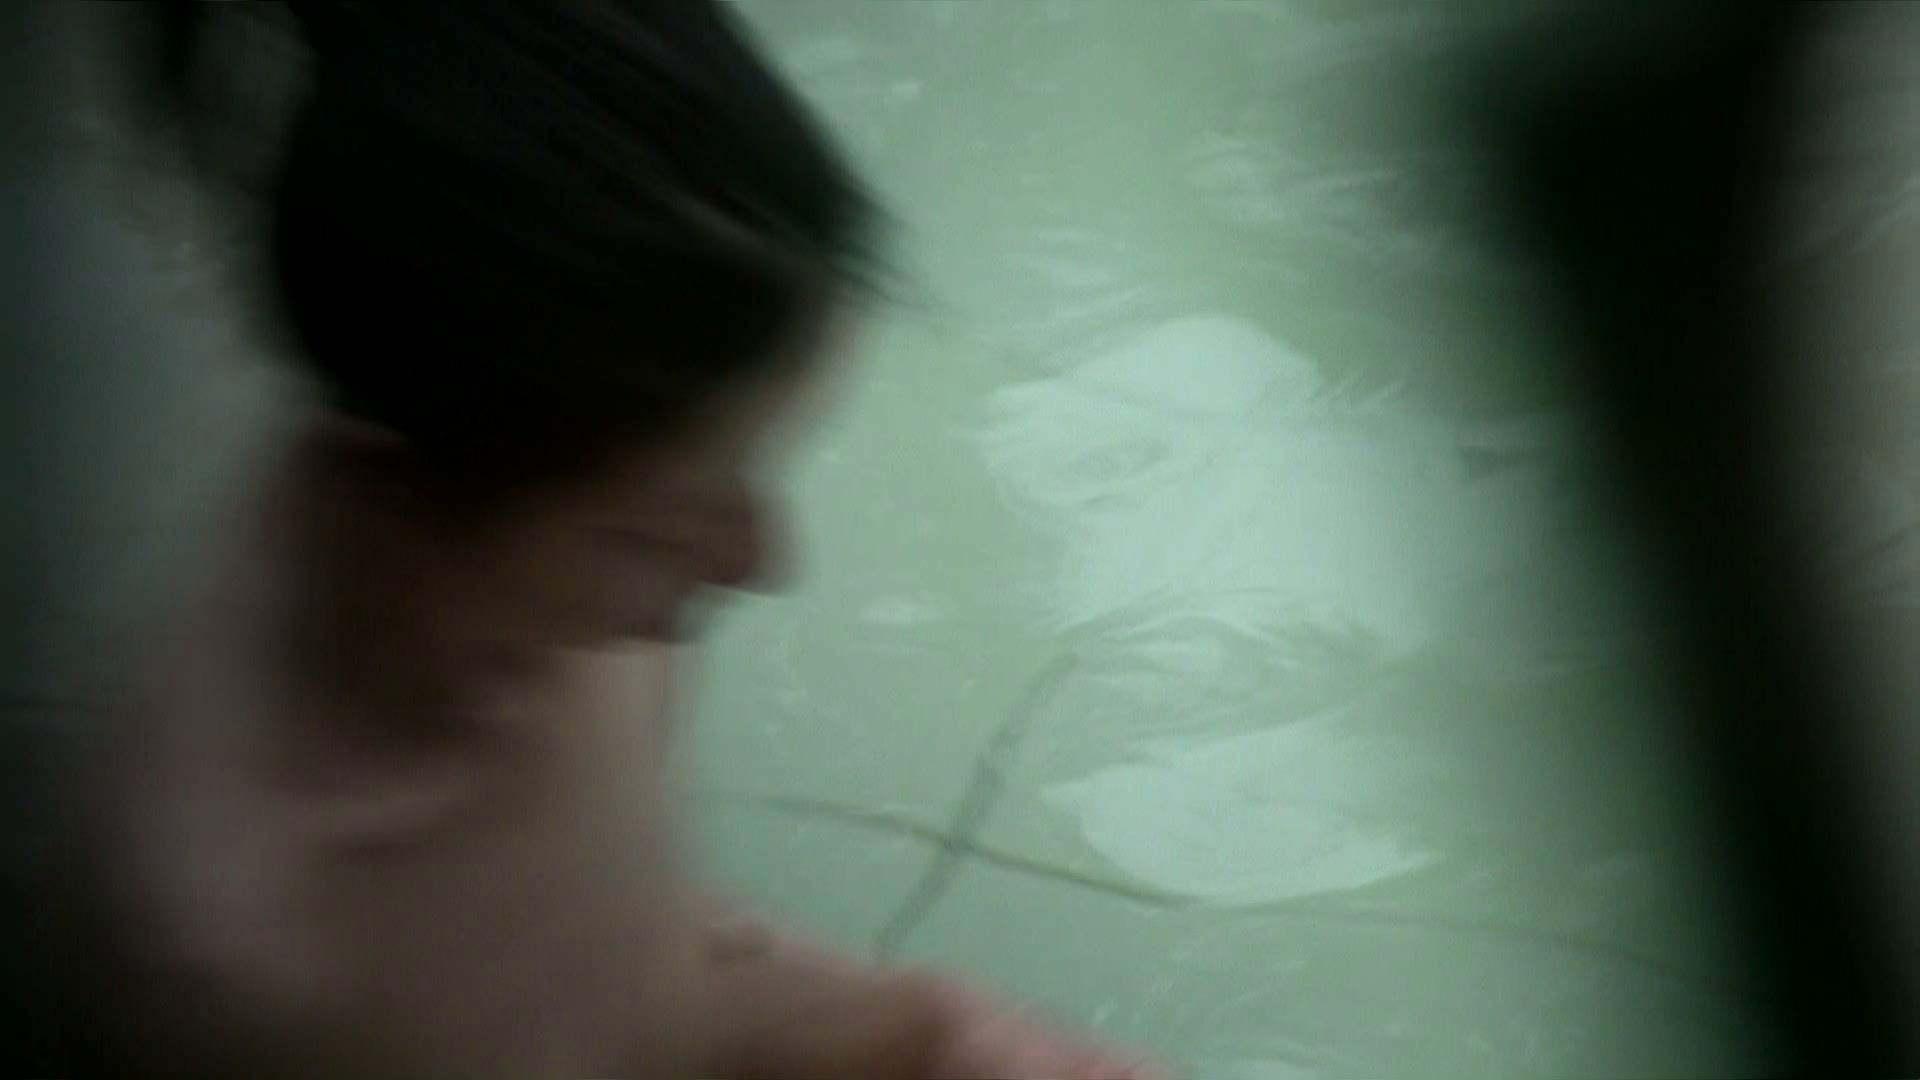 Aquaな露天風呂Vol.656 露天風呂編 | 盗撮シリーズ  91PIX 15